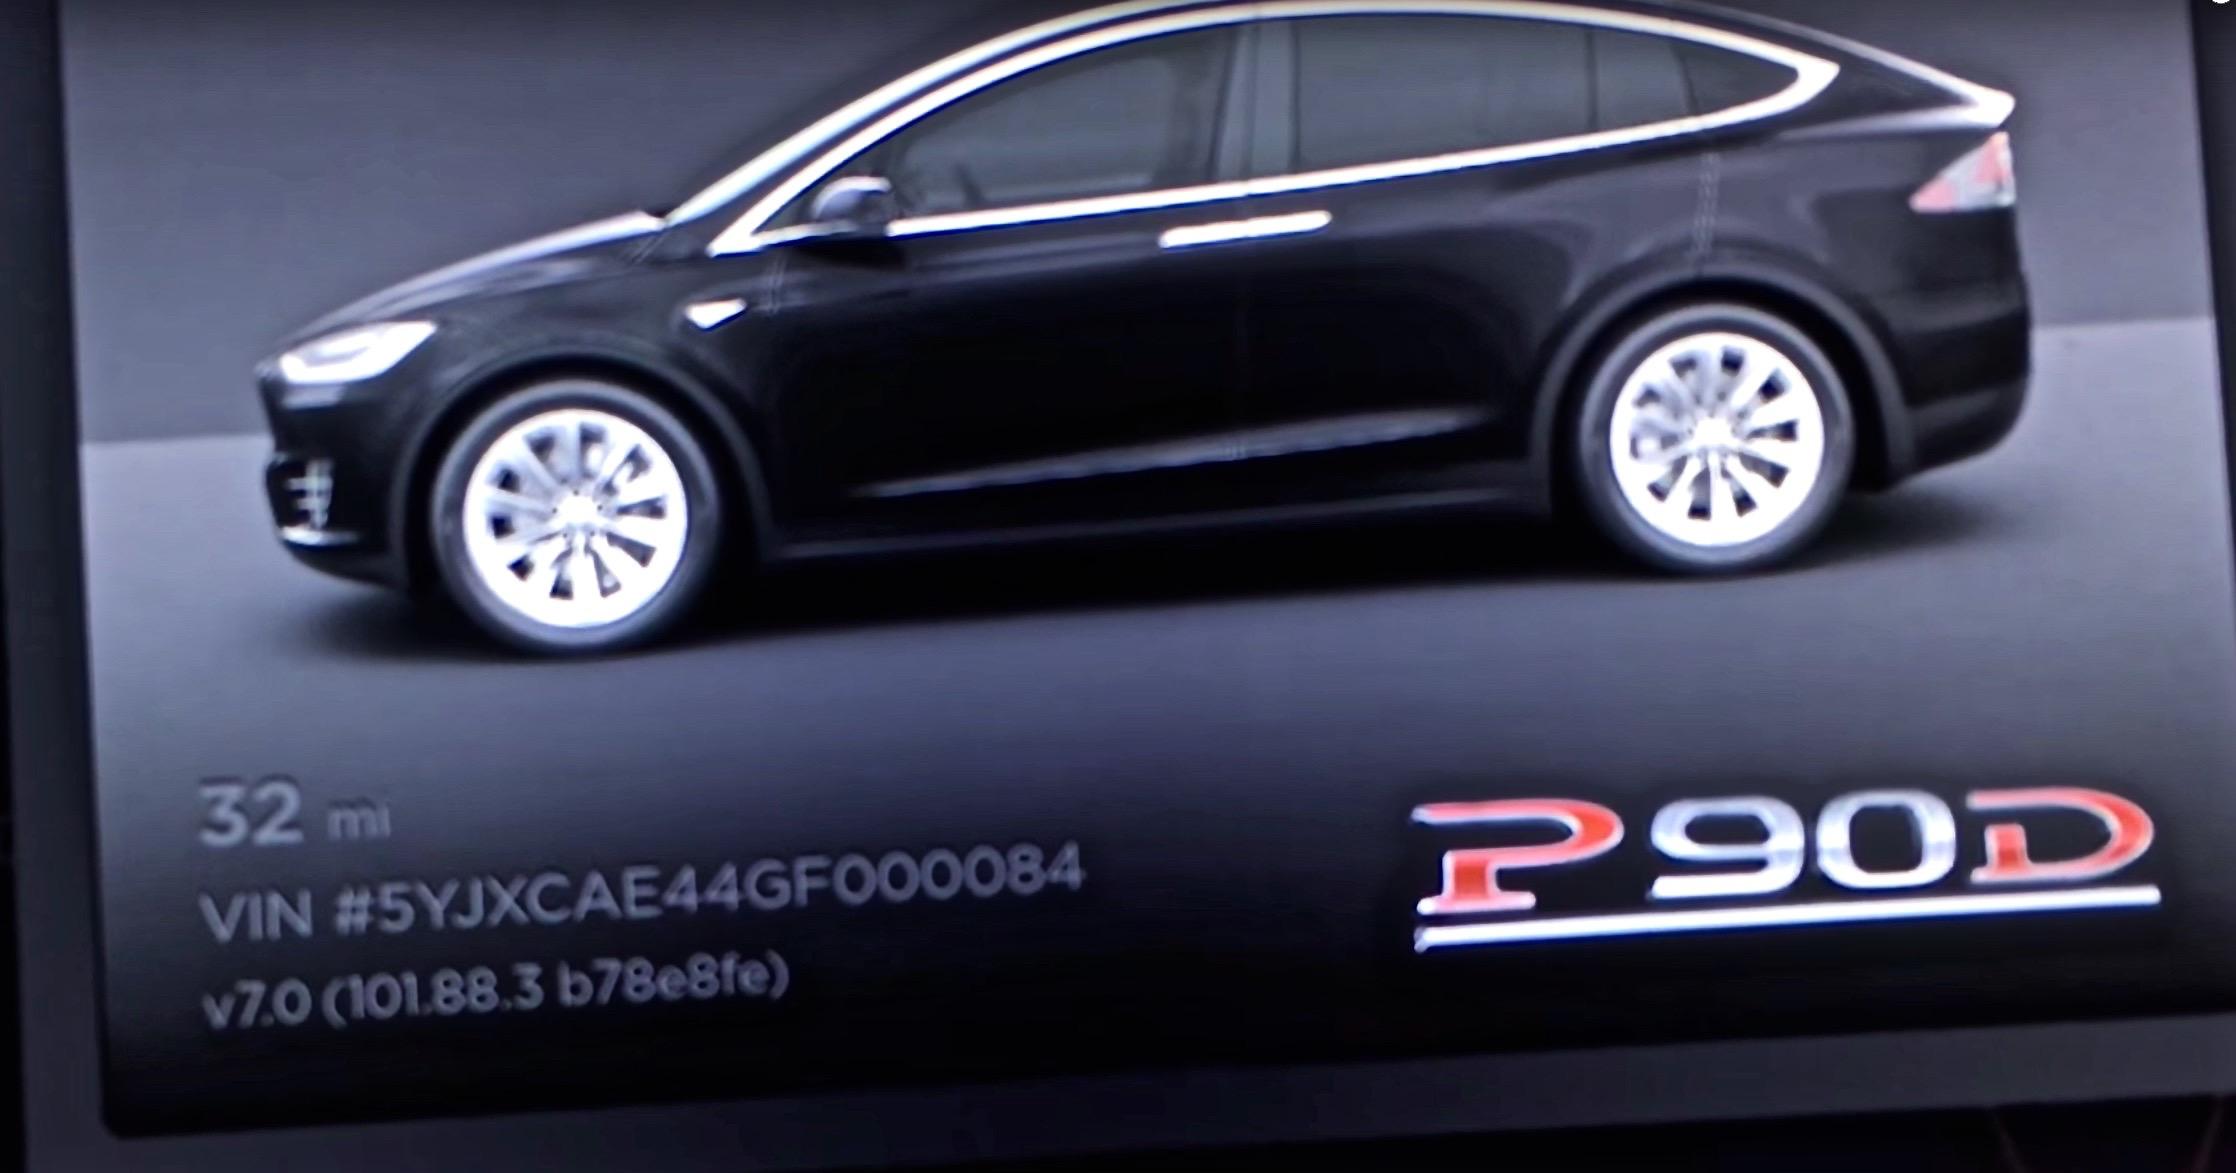 Model-X-Firmware-7-P90D-Ludicrous